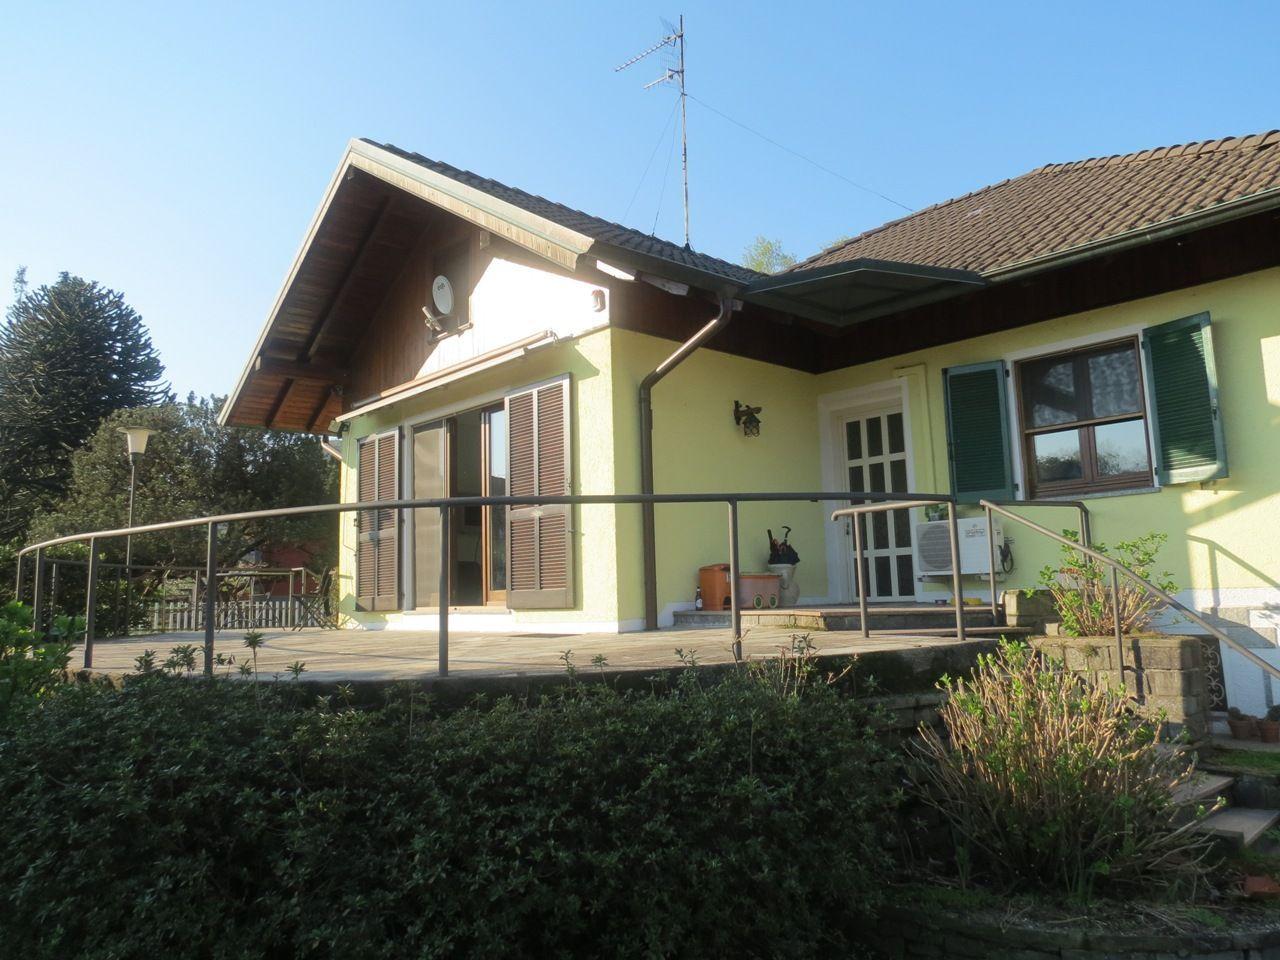 feriolo casa indipendente 2 camere con giardino e garage ForCase Con Stanze Nascoste In Vendita